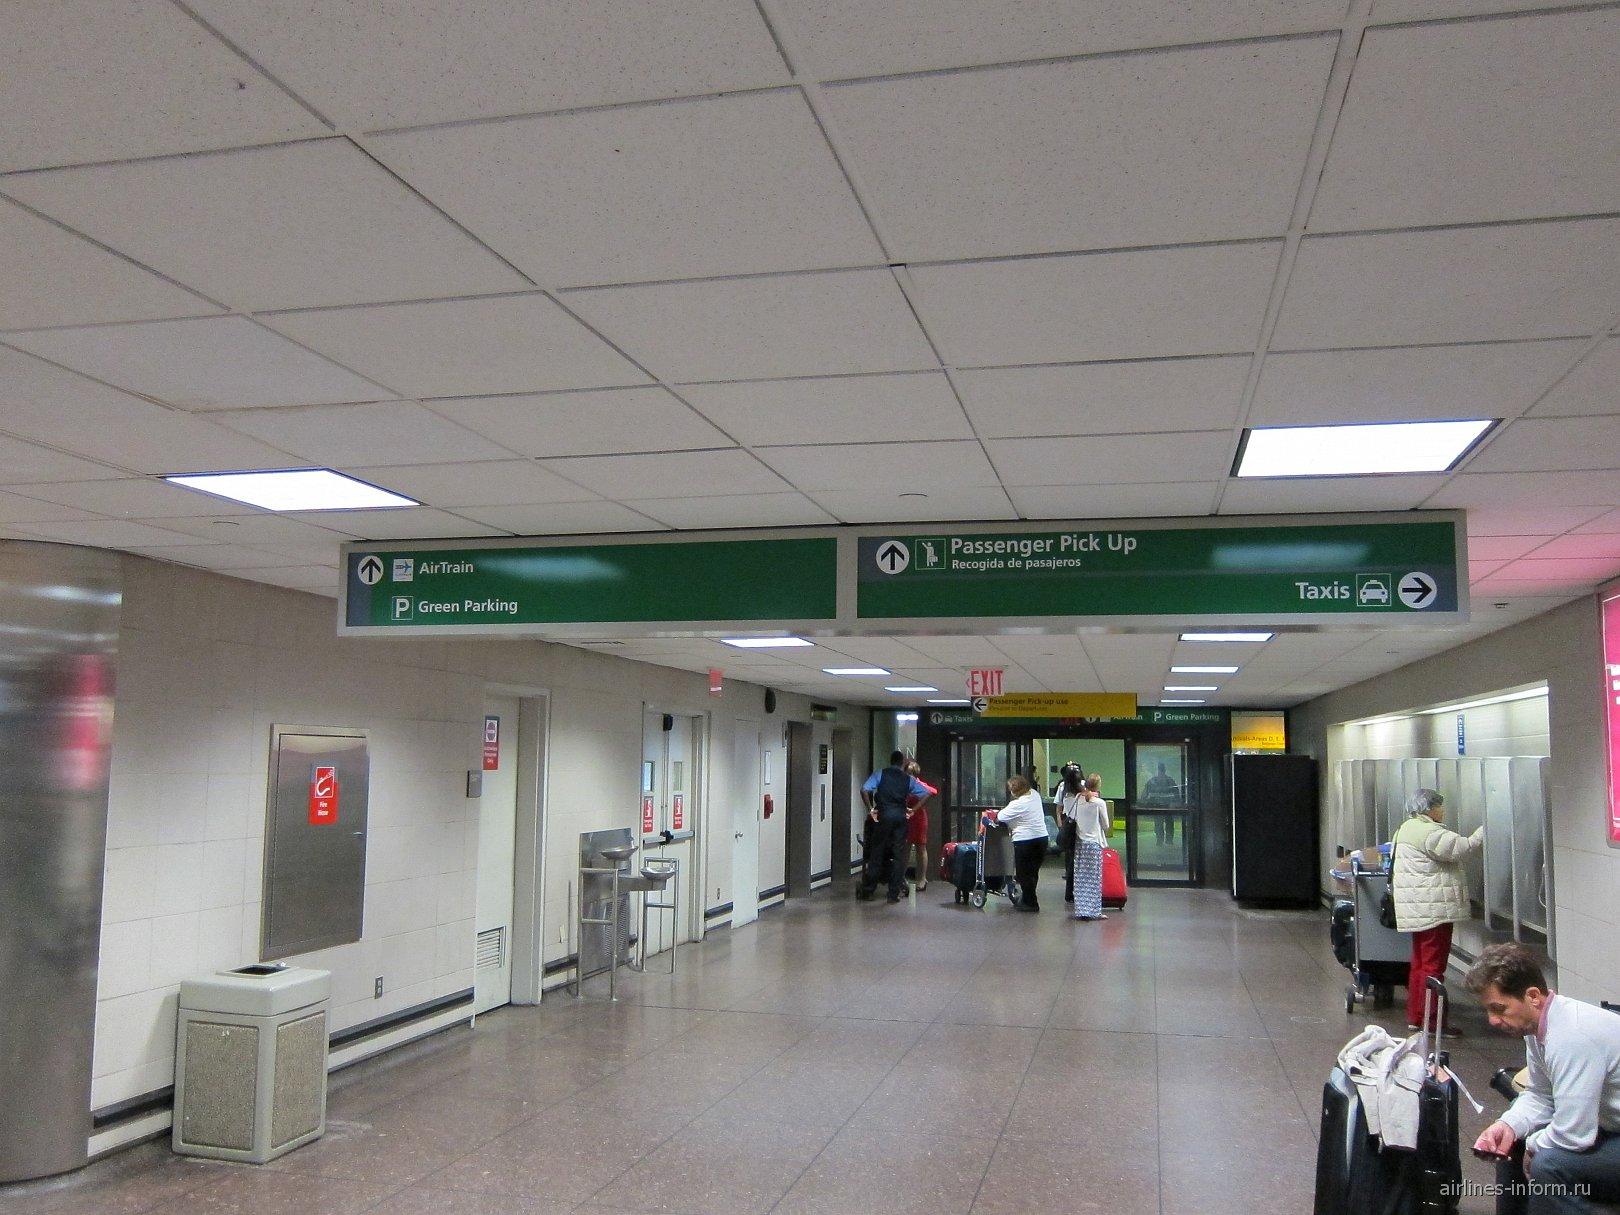 В аэропорту Нью-Йорк Джон Кеннеди